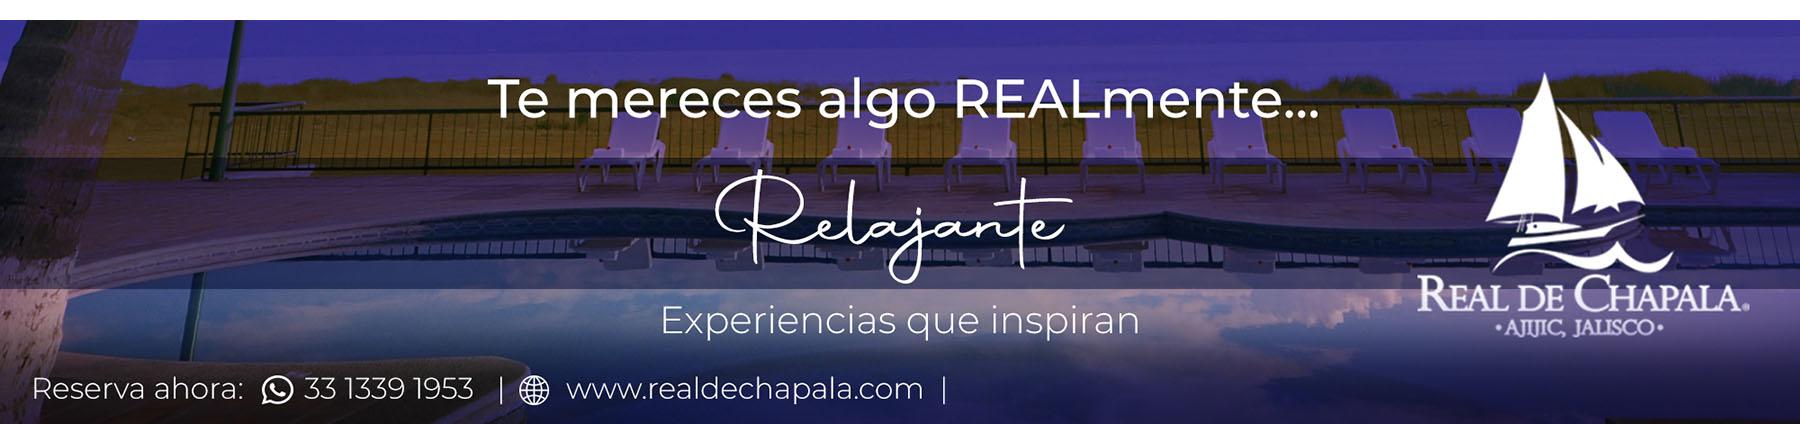 Real de Chapala, Hotel